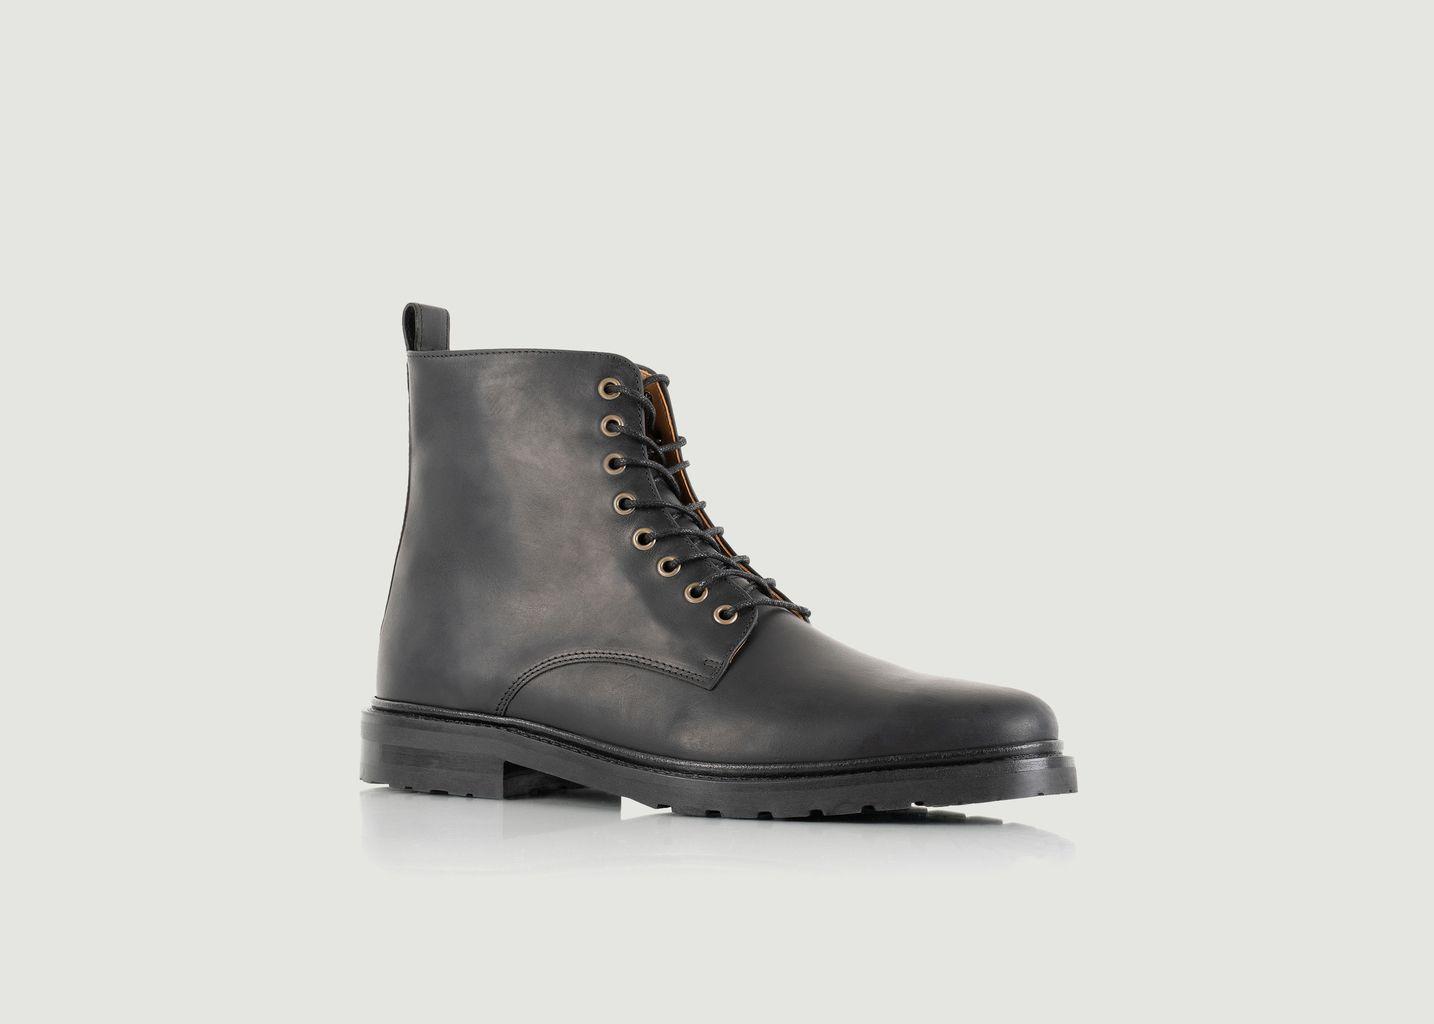 Boots Yukon - Bobbies Paris